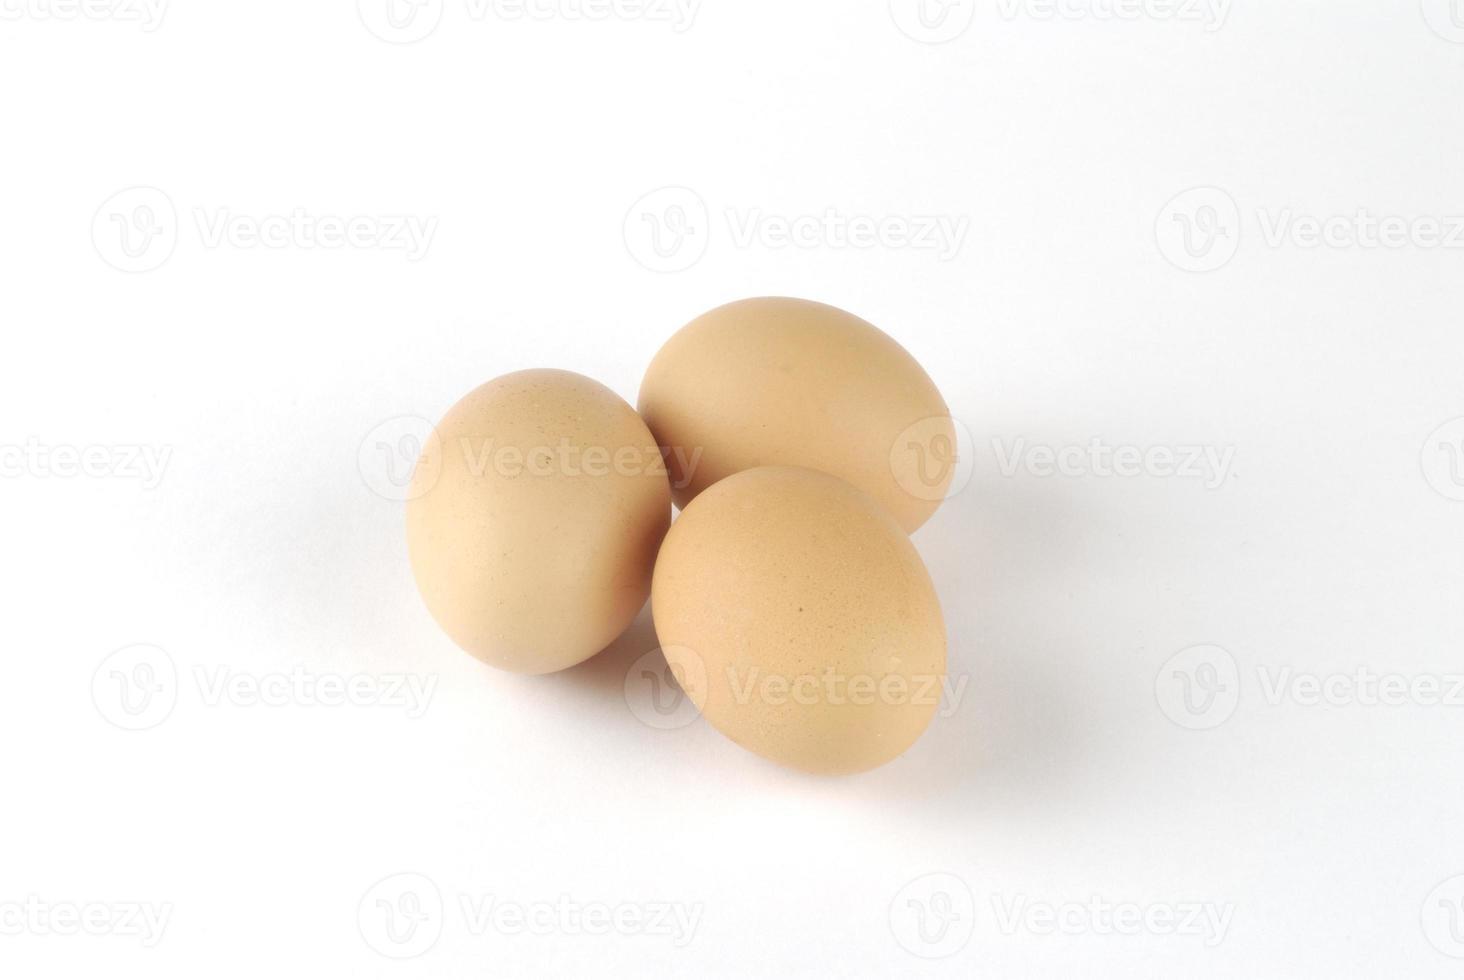 drie eieren foto